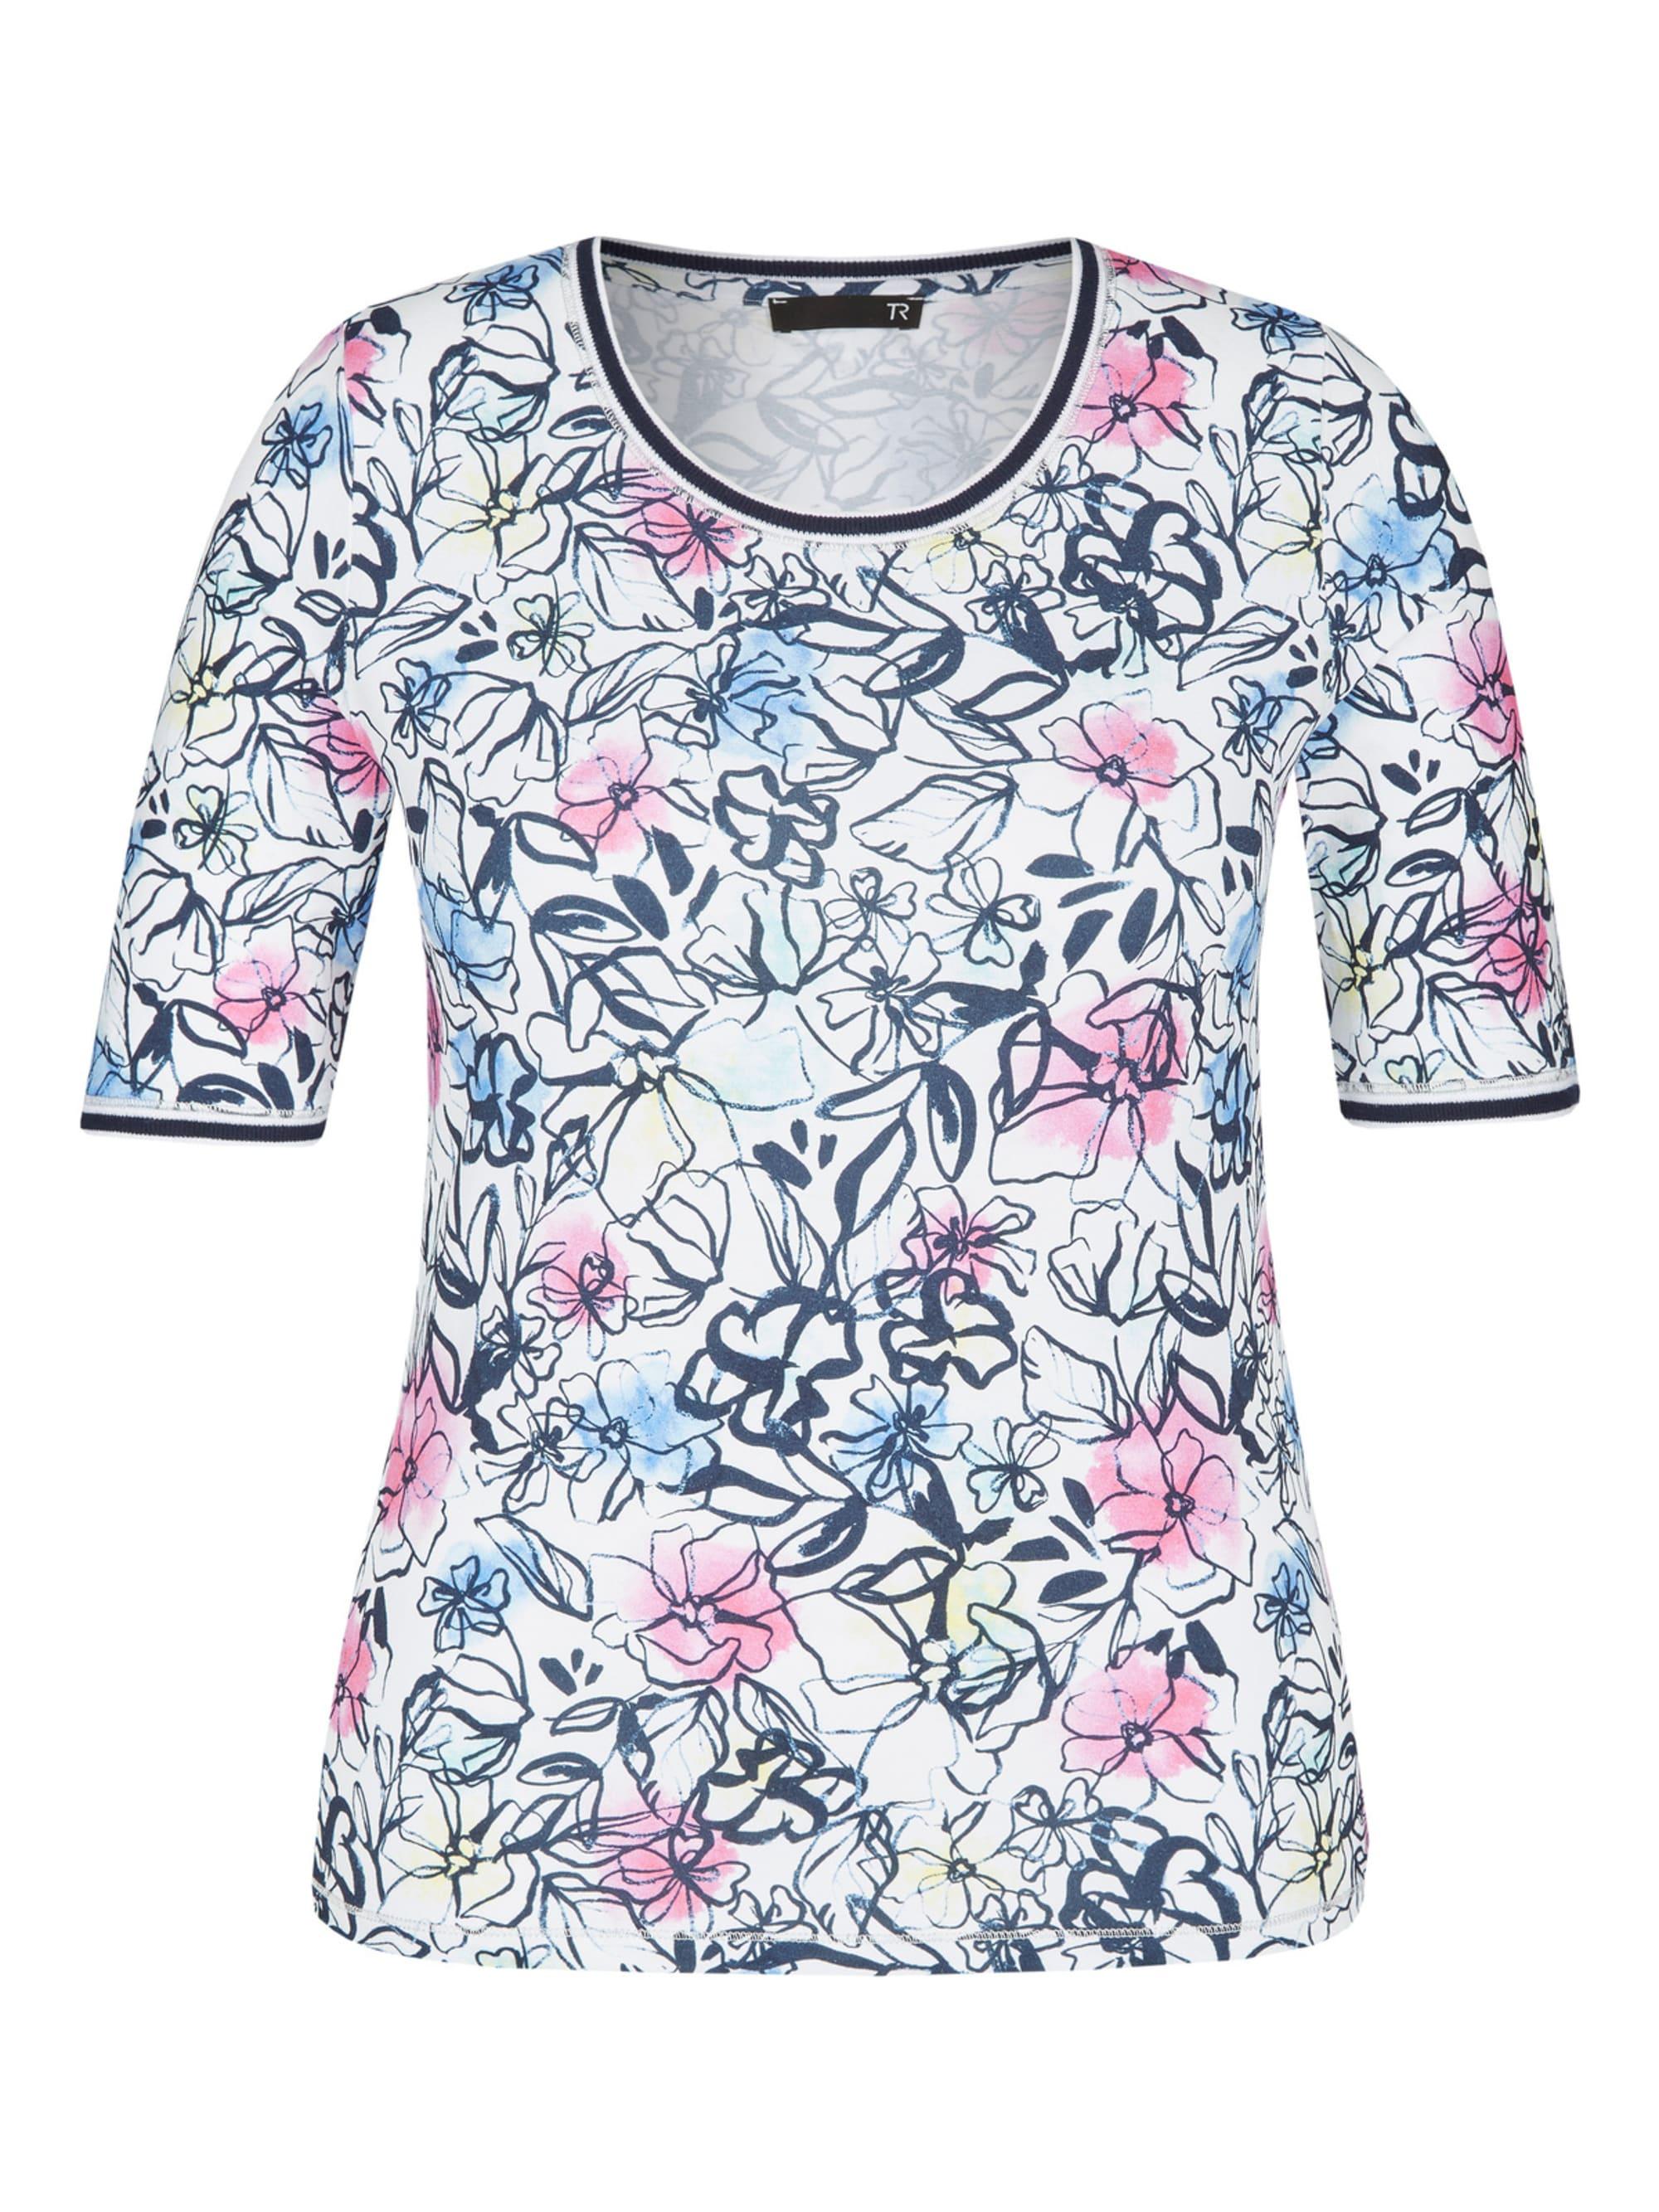 Thomas Rabe Shirt mit Allover-Print und Kontrastverarbeitung yodFj yjT1u